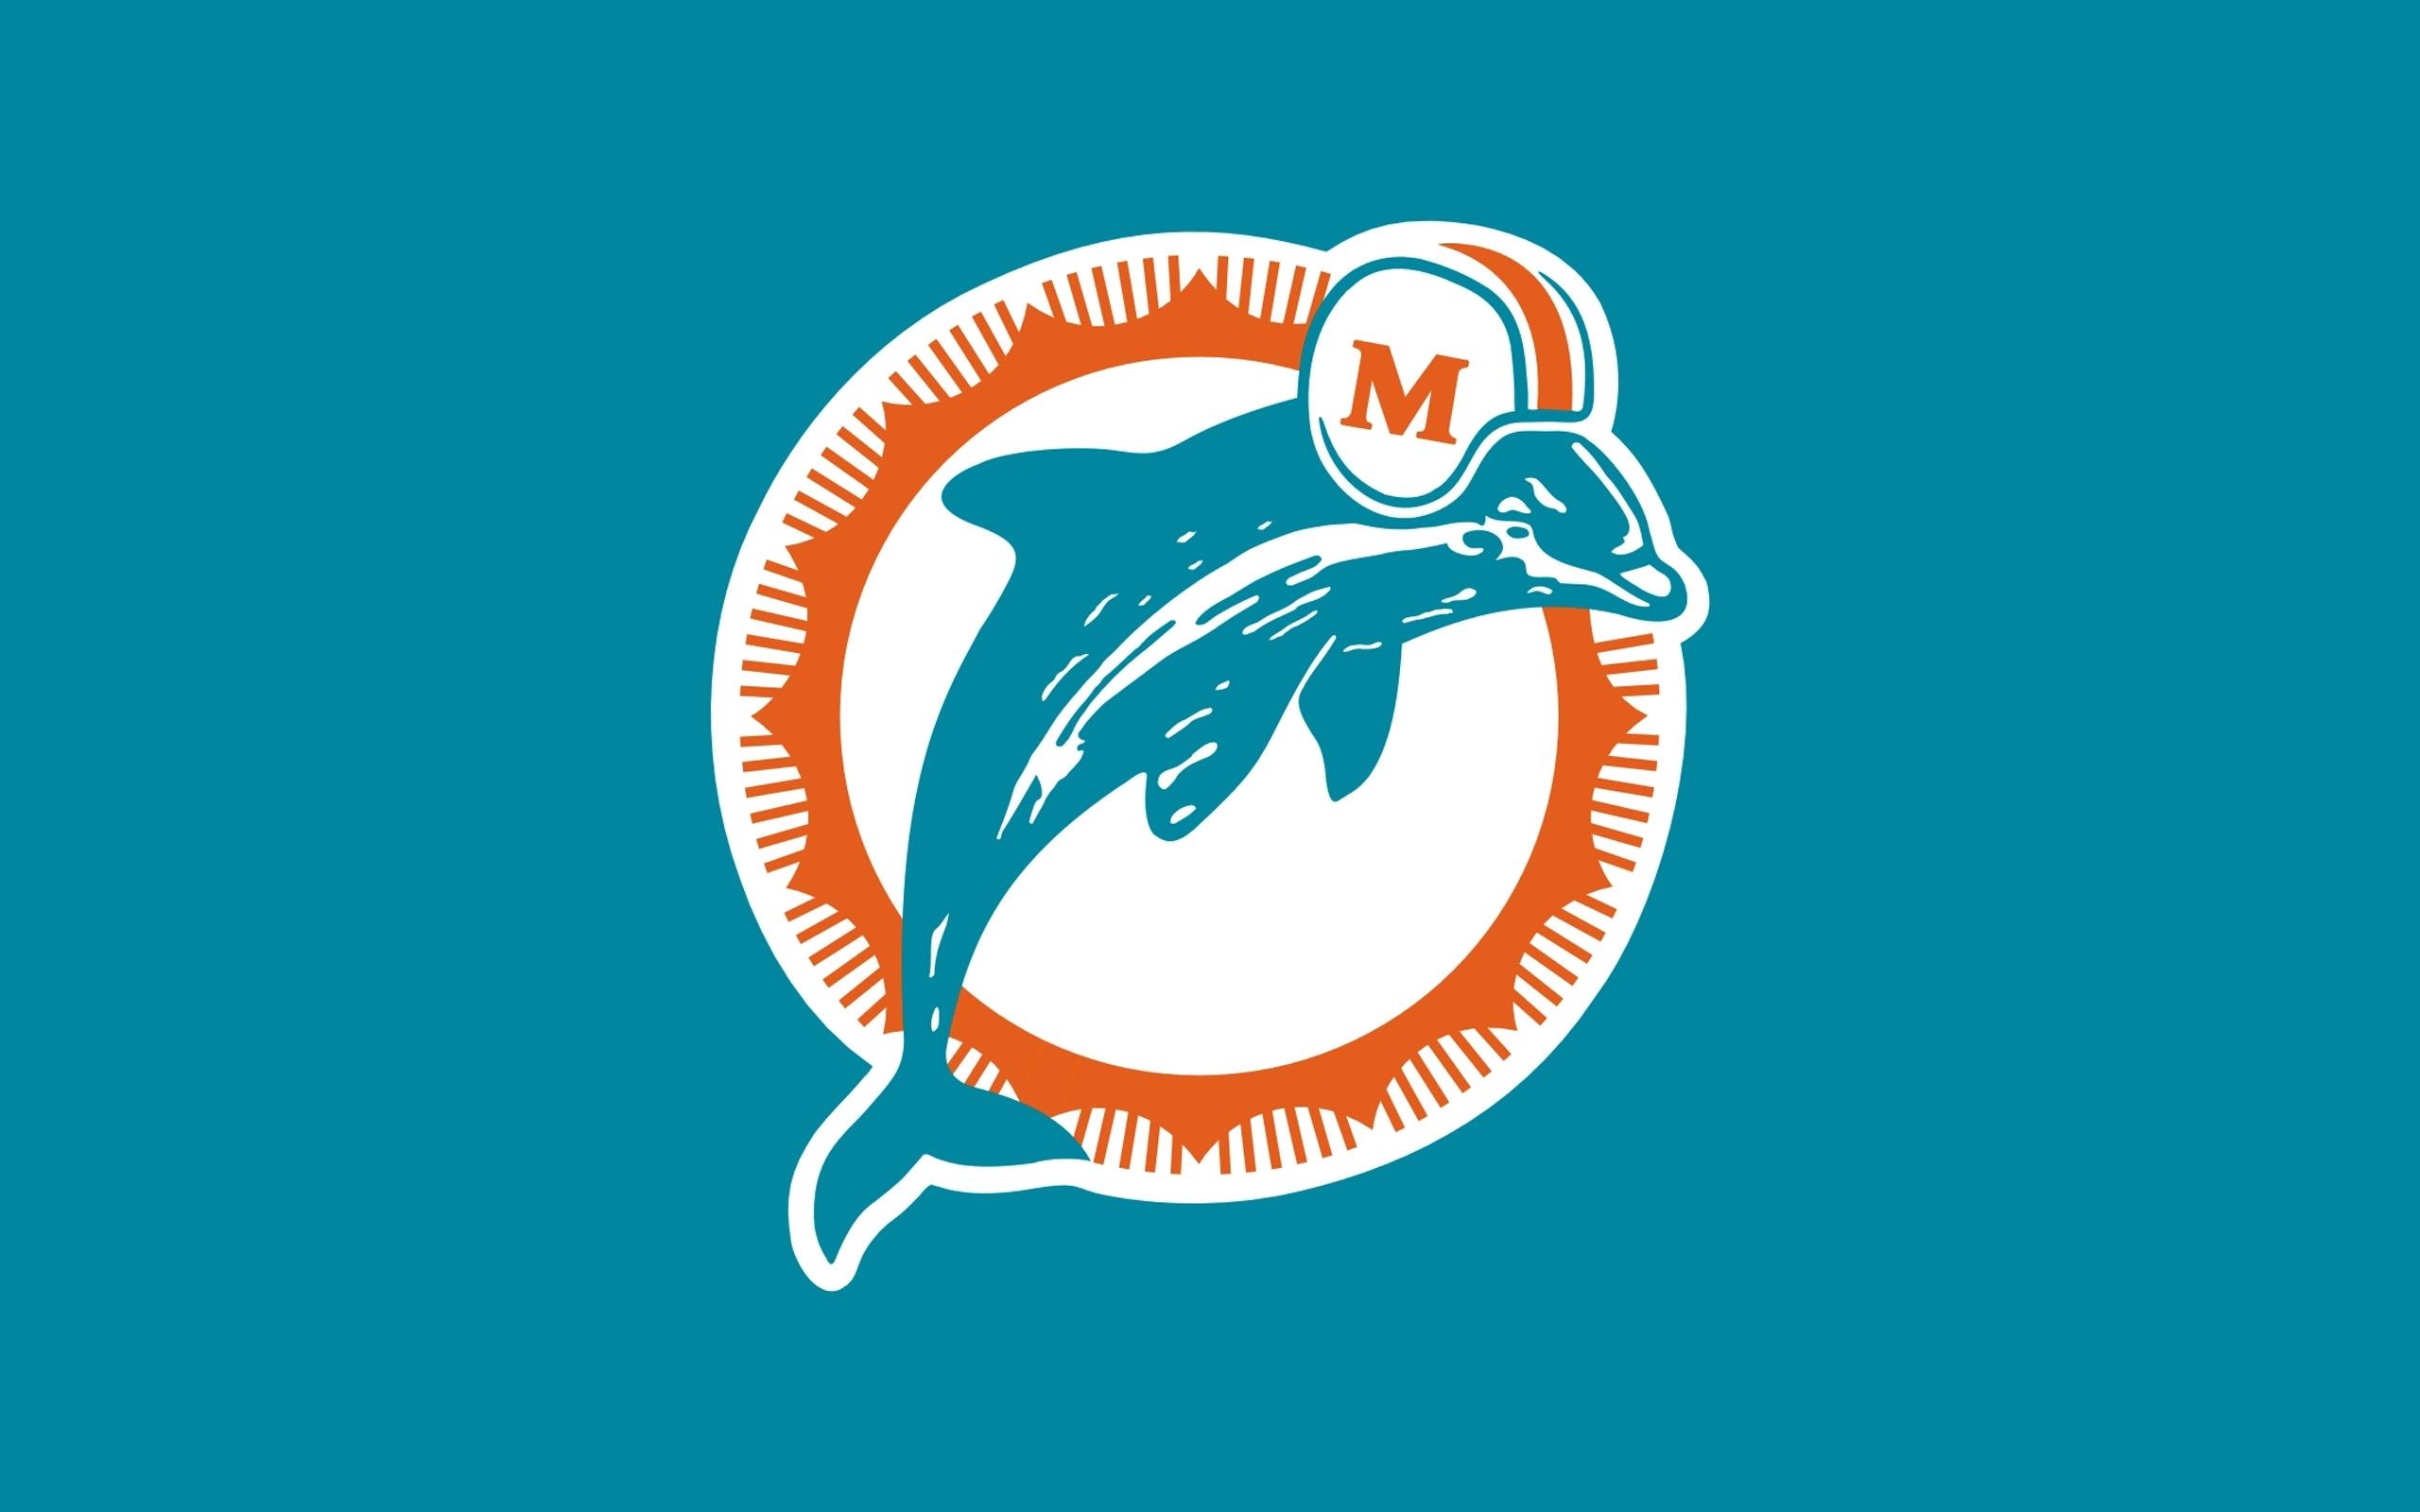 wallpaper : illustration, text, logo, circle, brand, miami dolphins